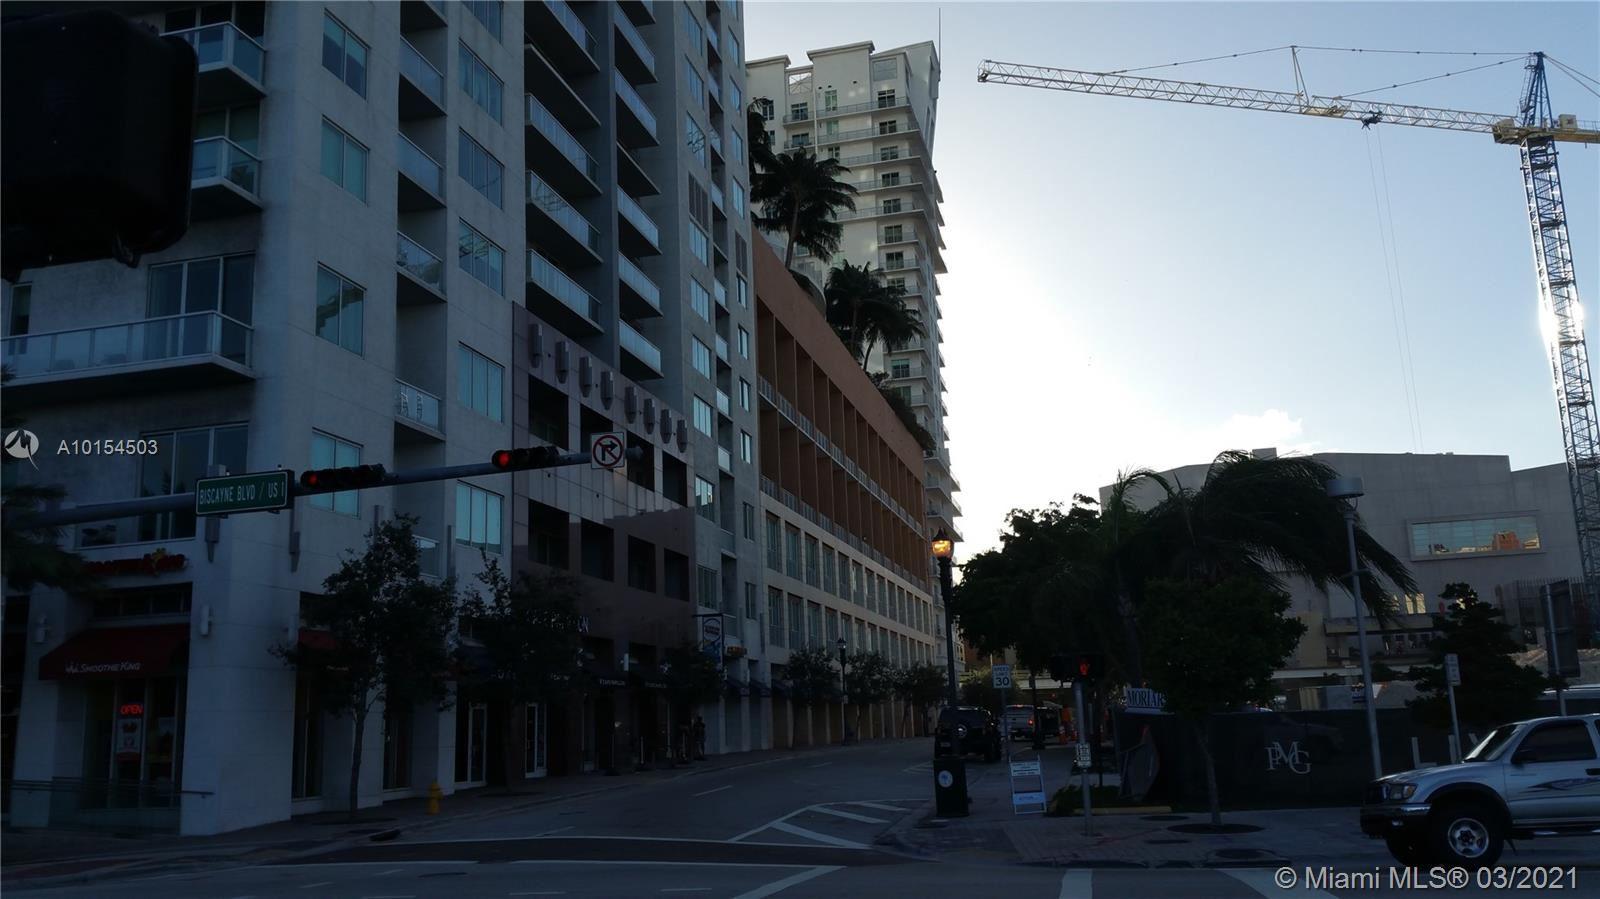 234 NE 3rd St #LPH07, Miami, FL 33132 - #: A10154503